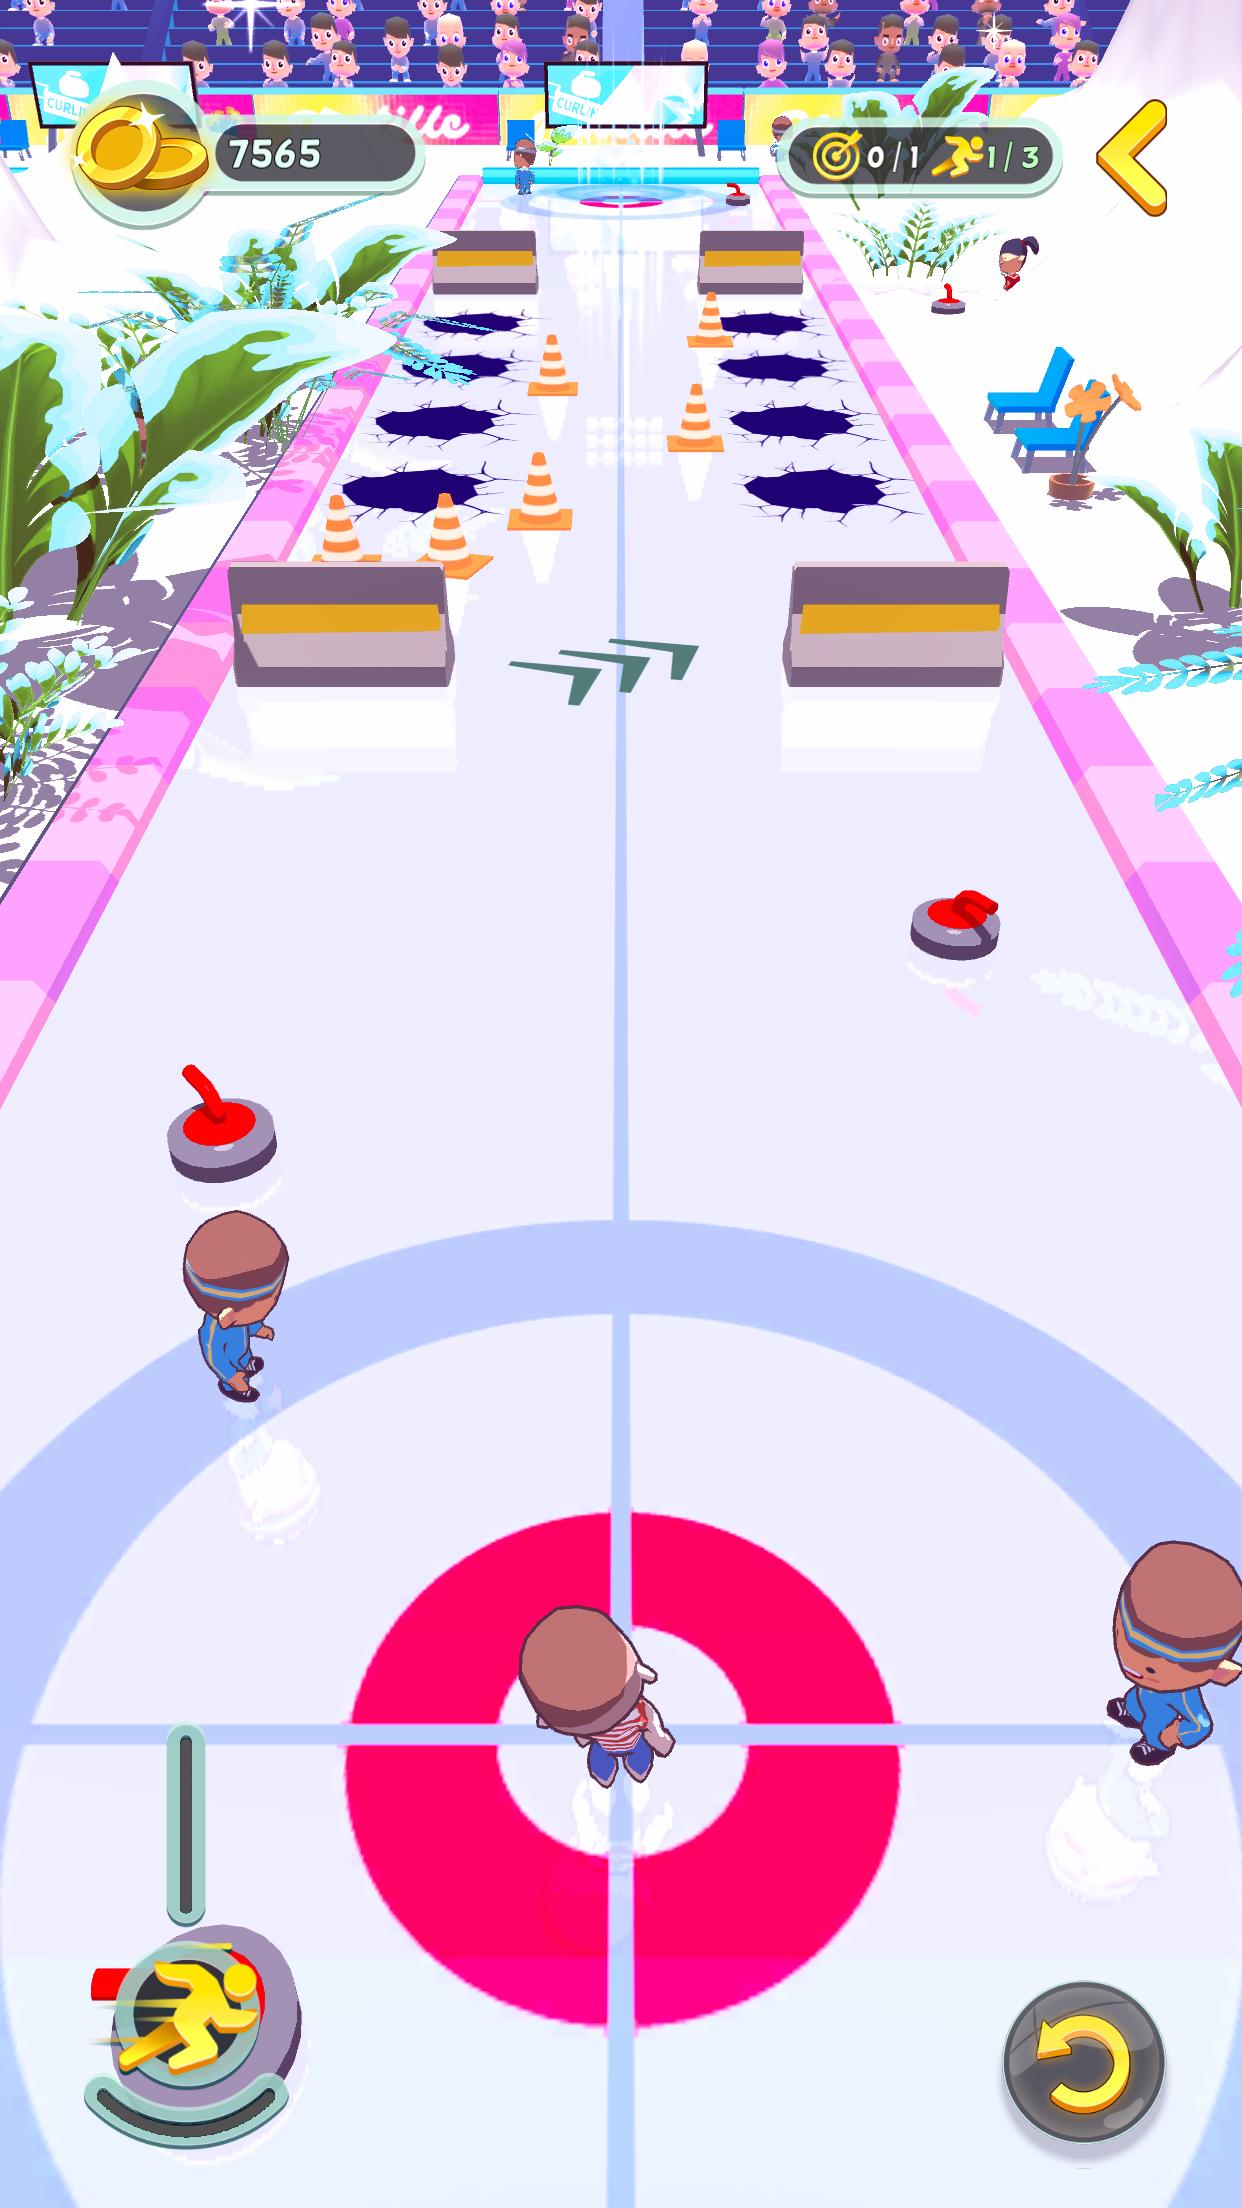 Curling level